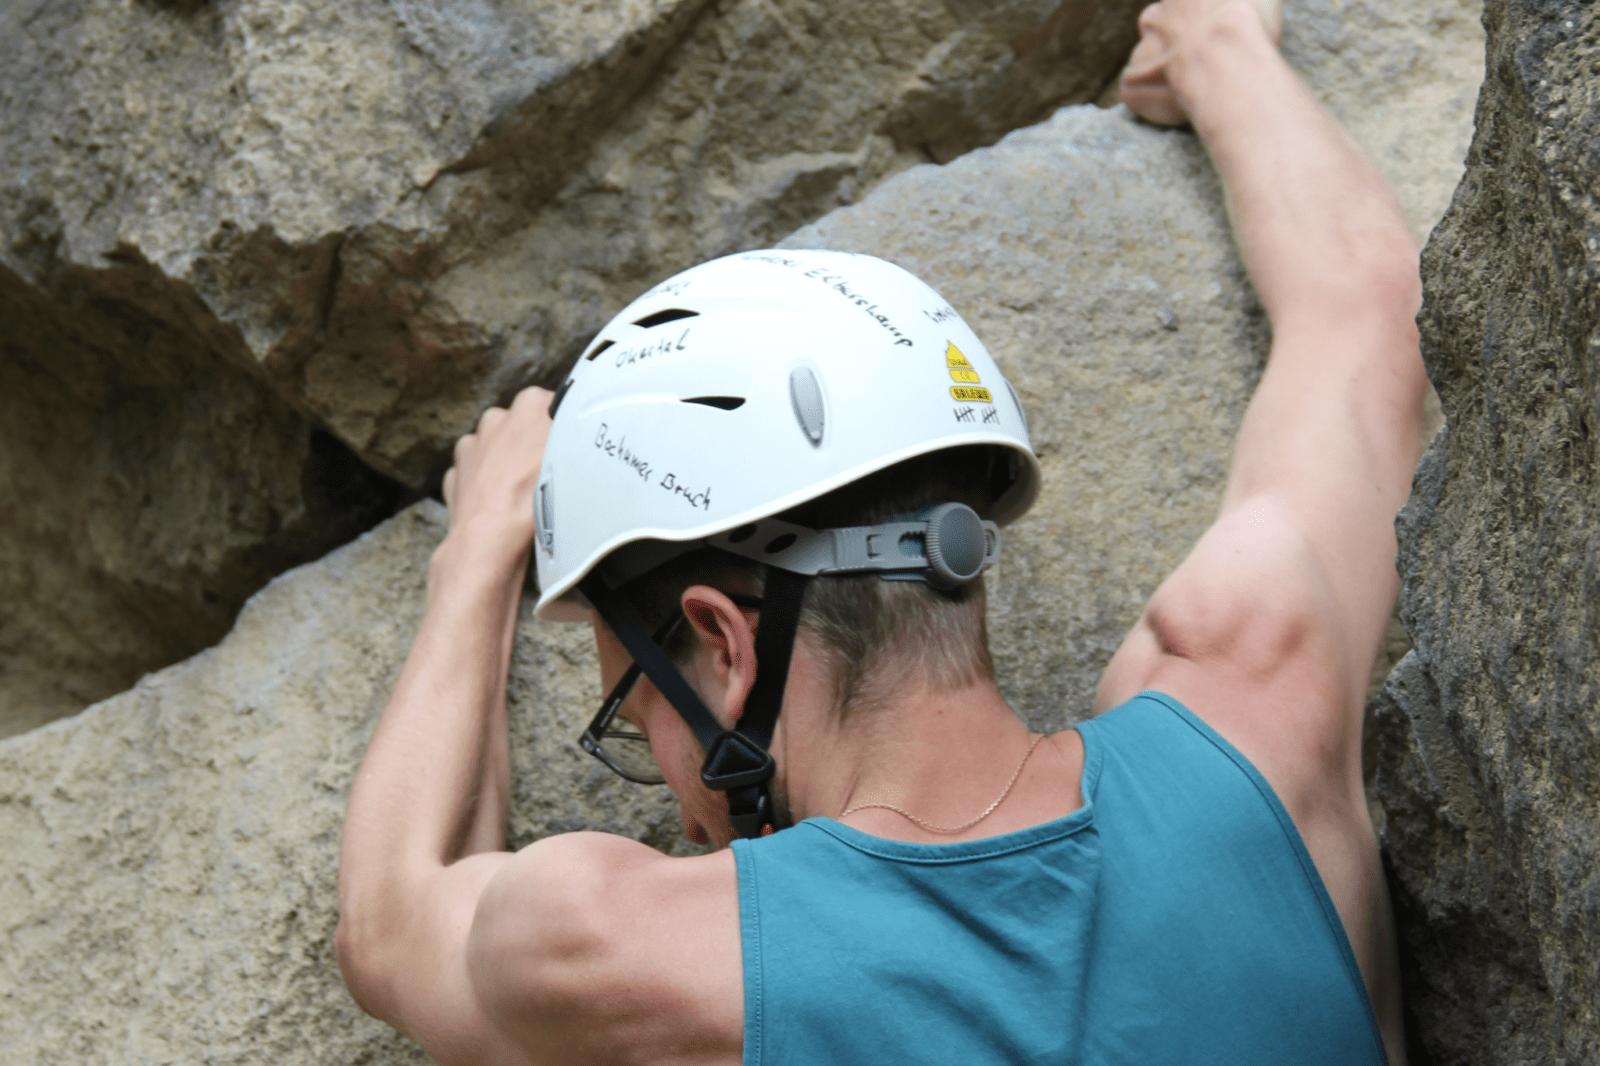 Kletterhelm, Kletterhelme, Bergsteigerhelm, Bergsteigerhelme, Helm zum Klettern, Hartschalenhelm